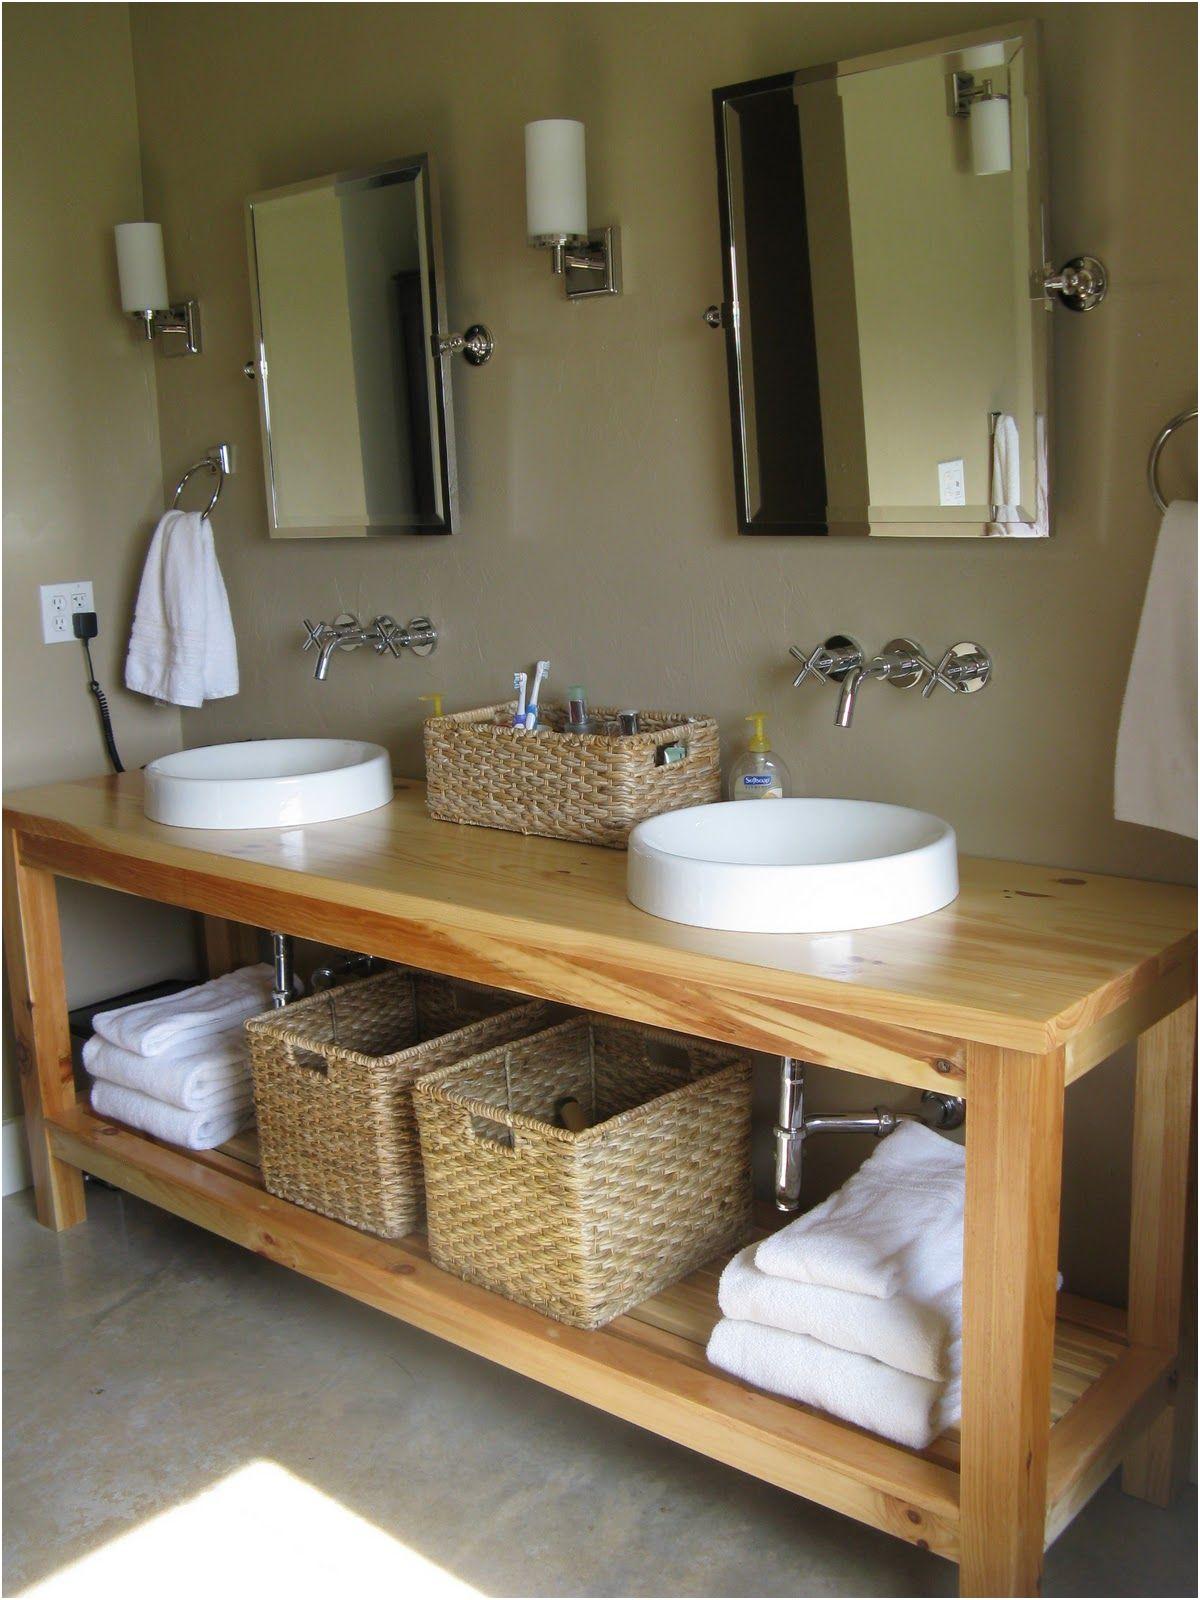 65 Inch Bathroom Vanity Single Sink Luxury Open Bathroom Vanity Healthy Home Design